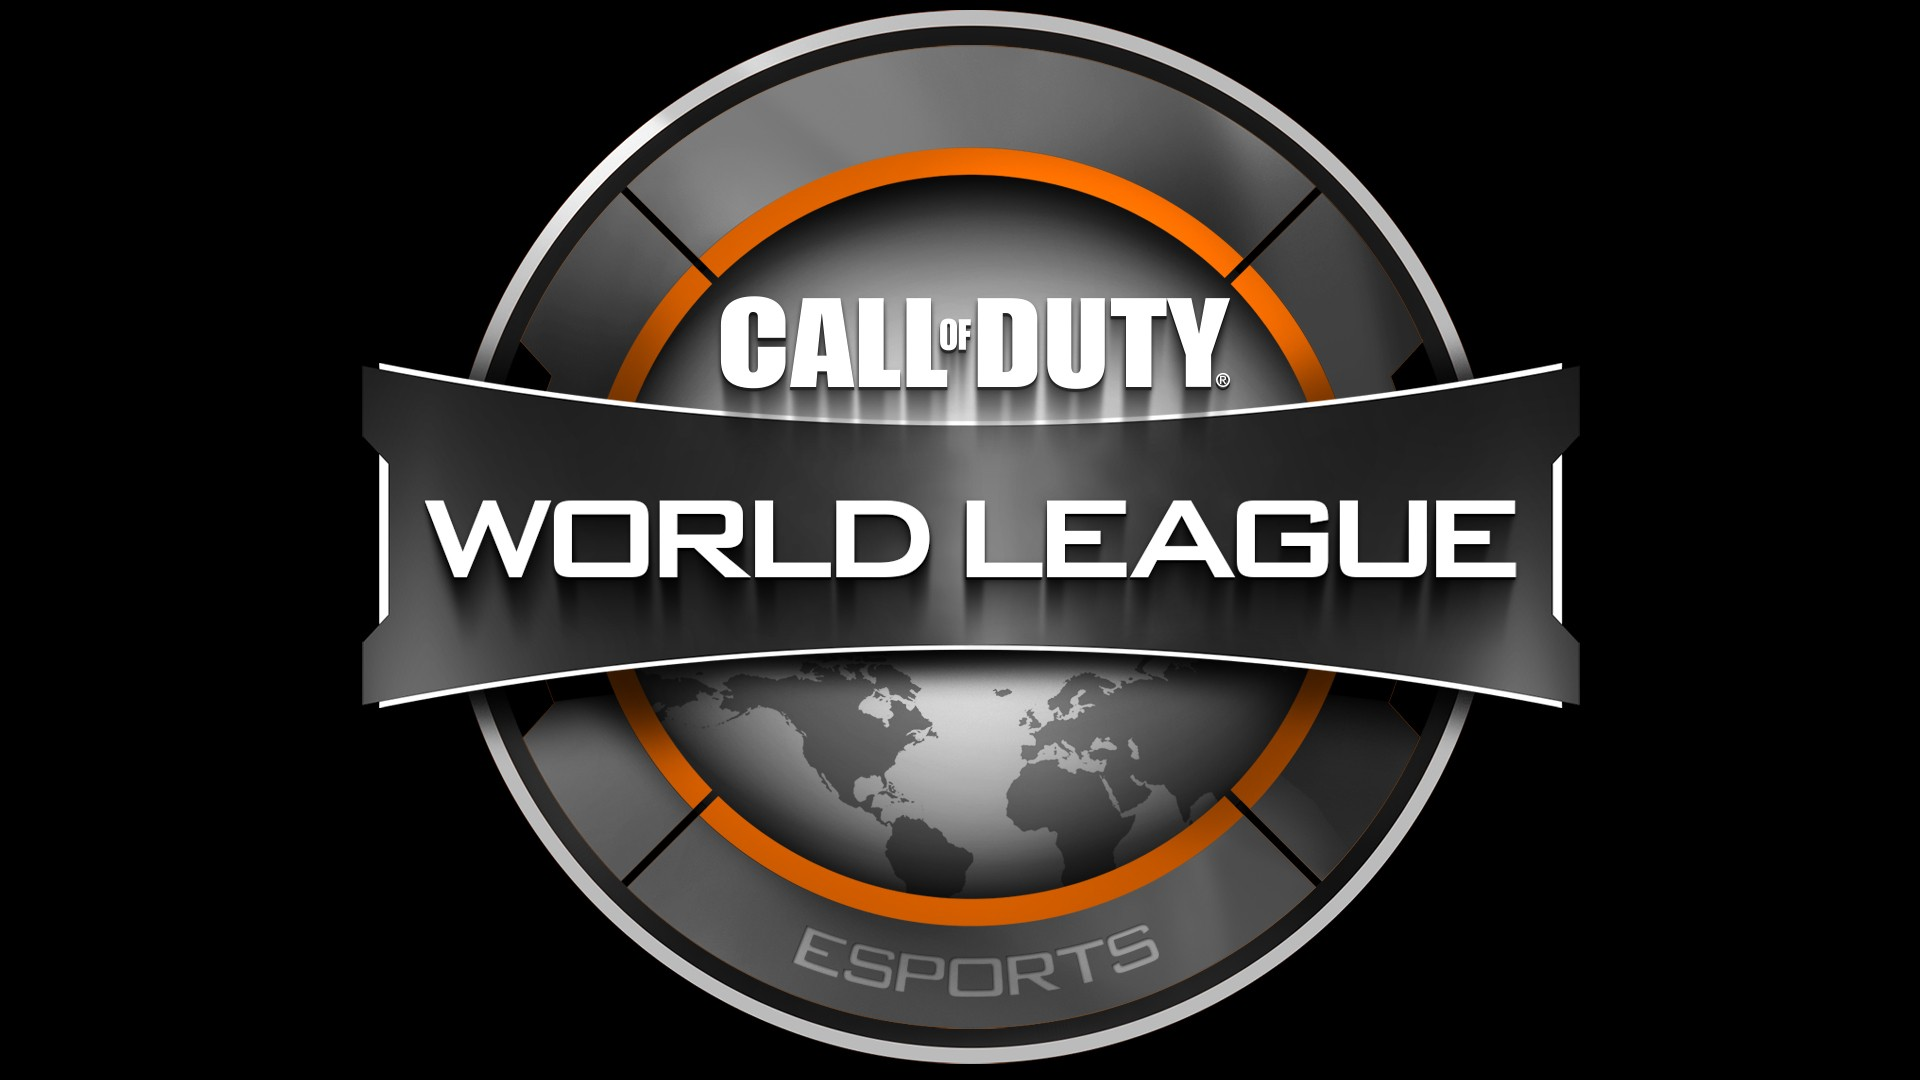 Black Ops 3 Has A New ESports League